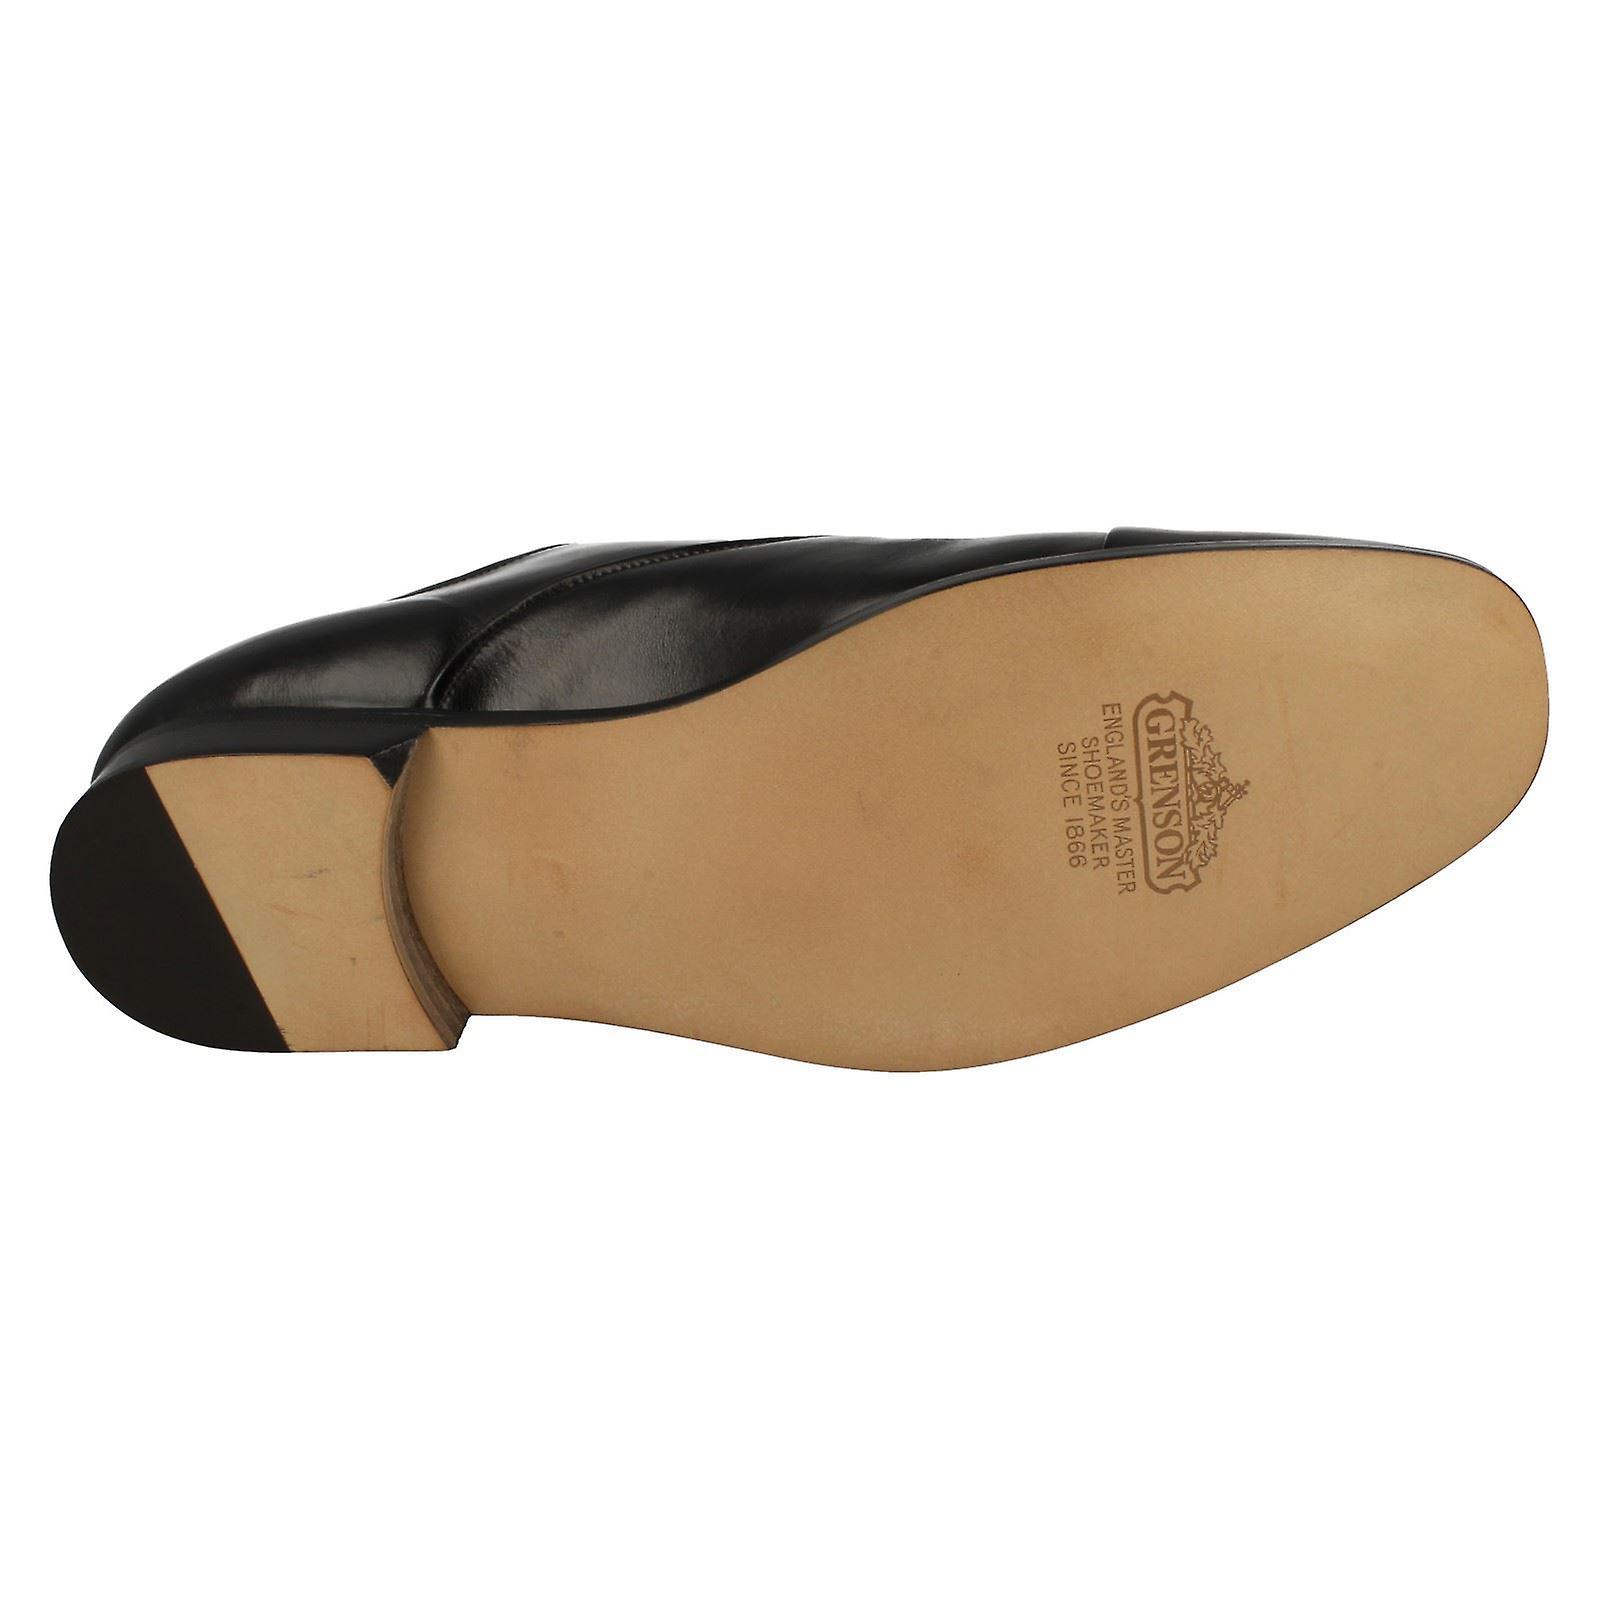 Mens Grenson Plafonné Toe Chaussures Orleans